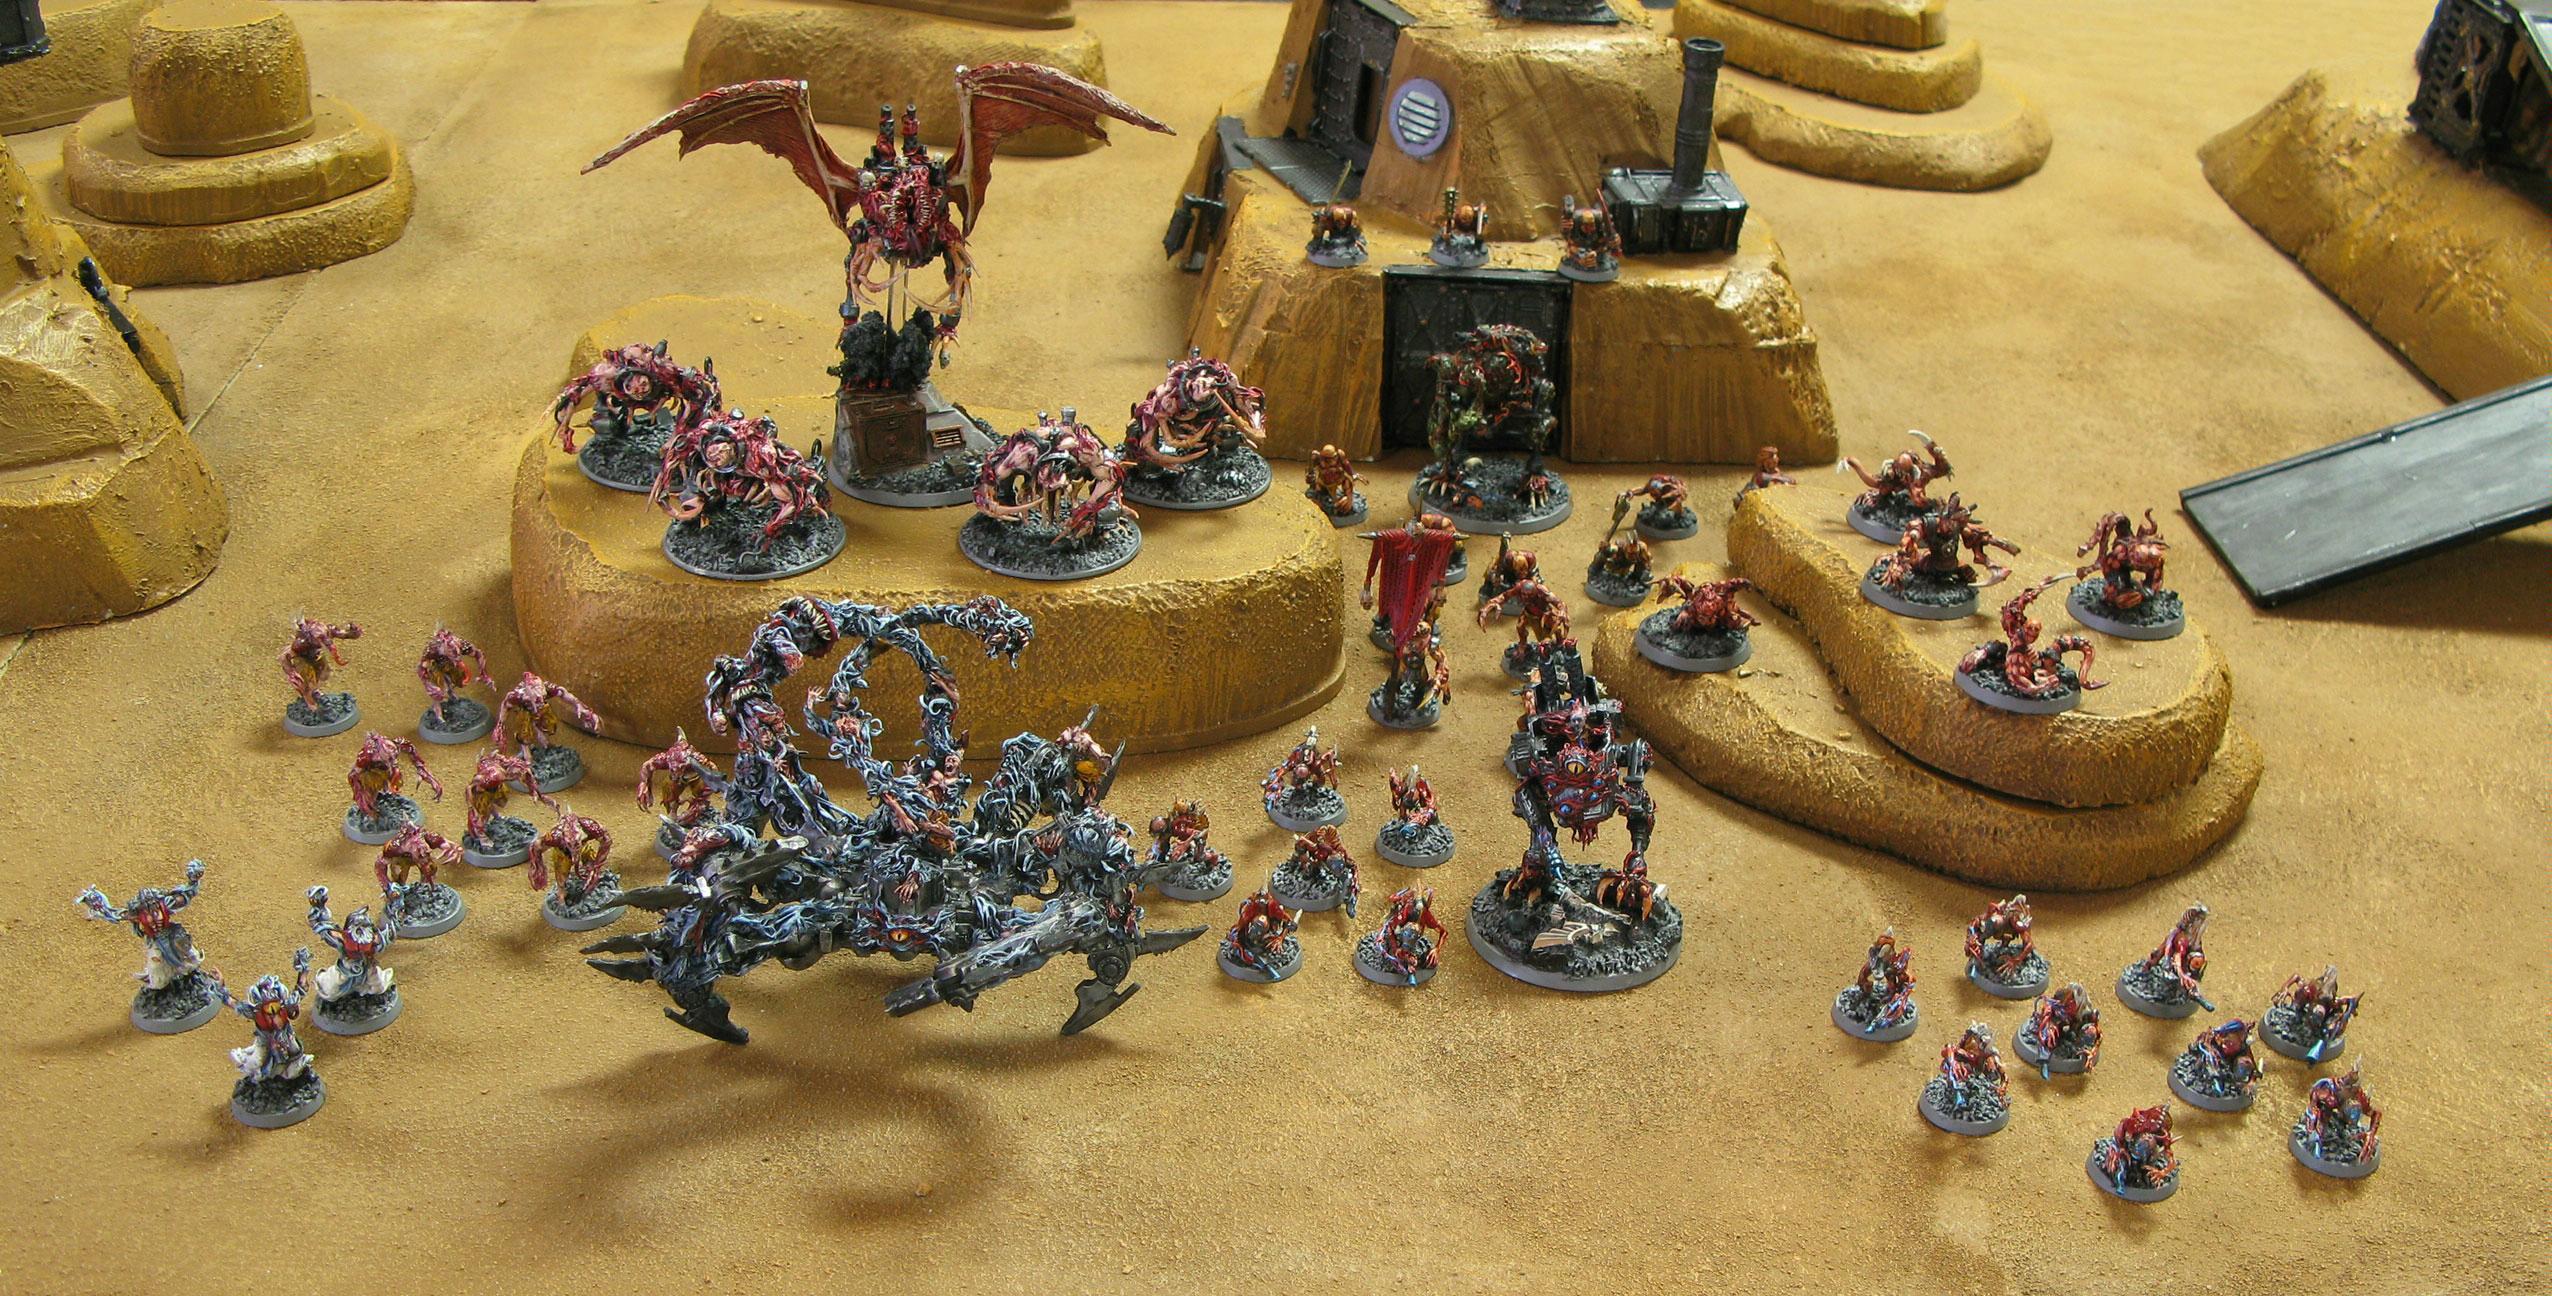 Army, Chaos Daemons, Conversion, Daemons, Warhammer 40,000